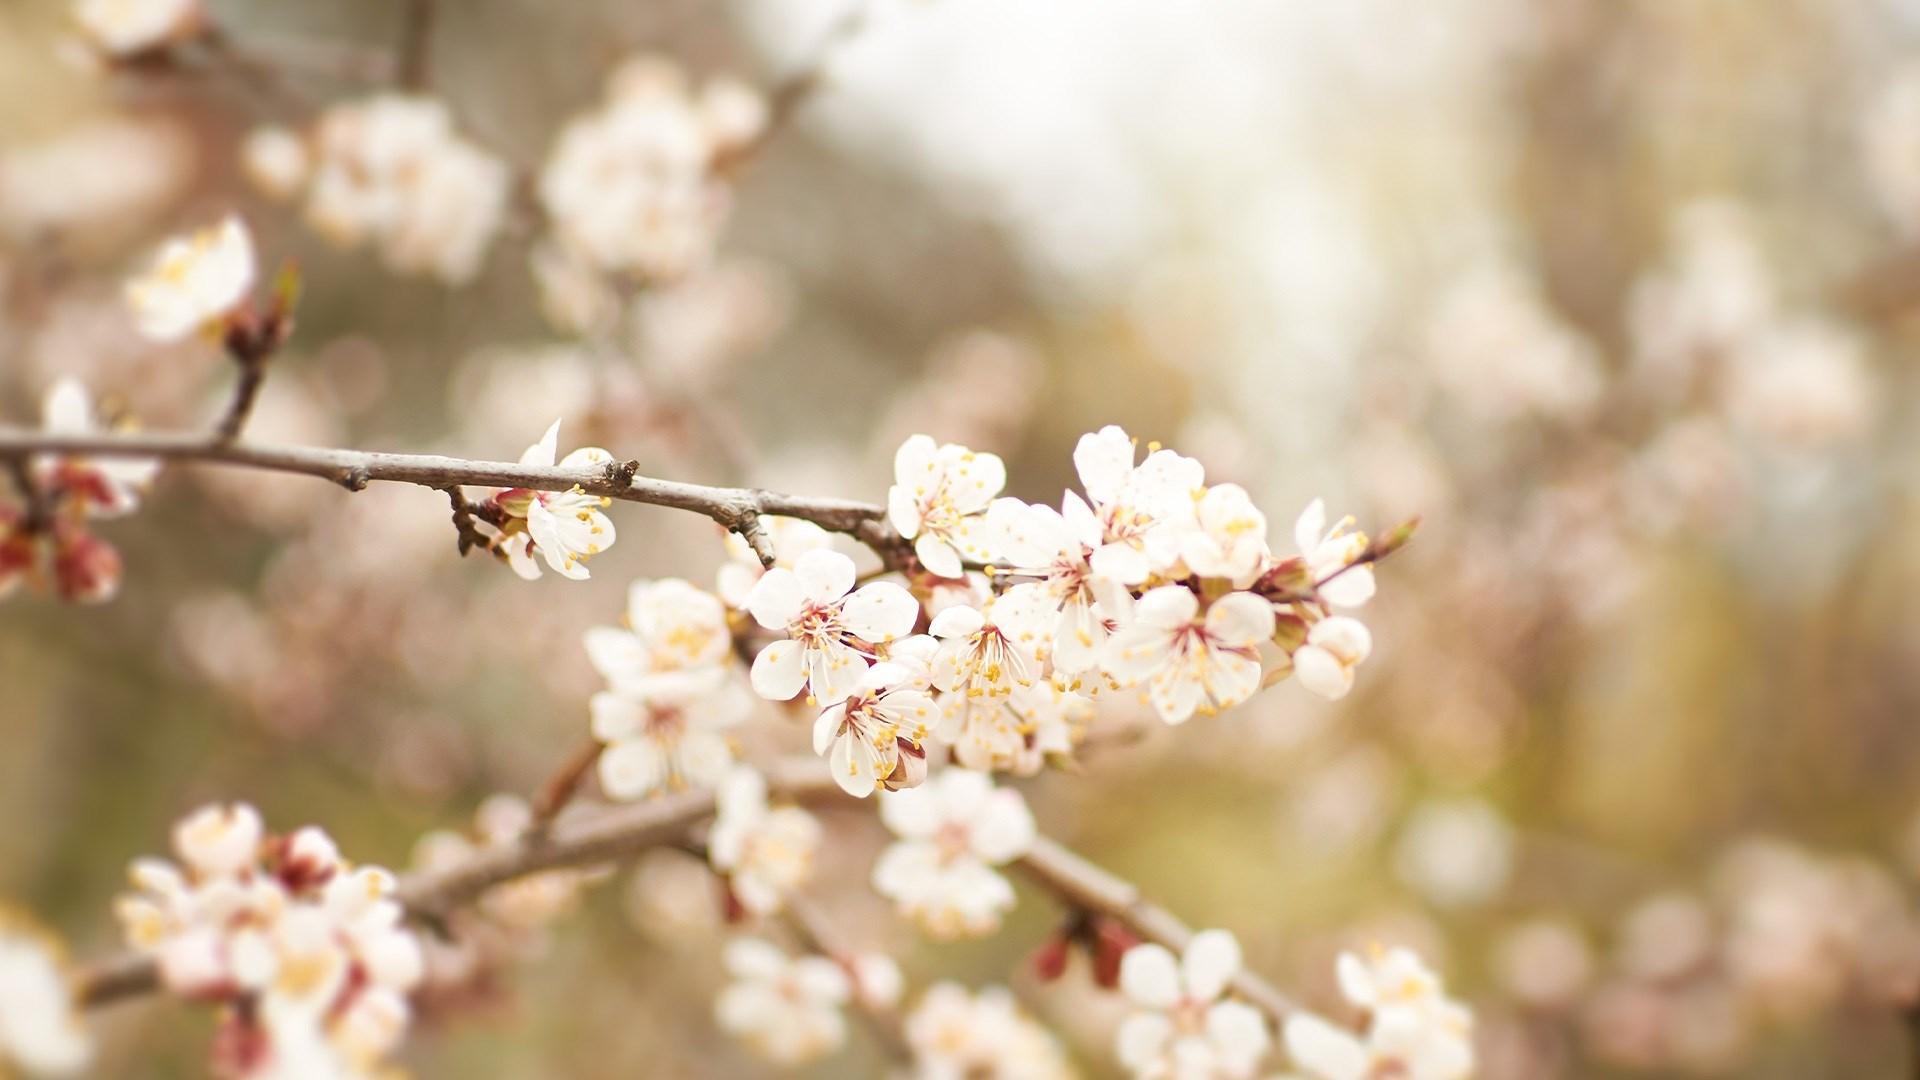 Apricot Blossom Nature